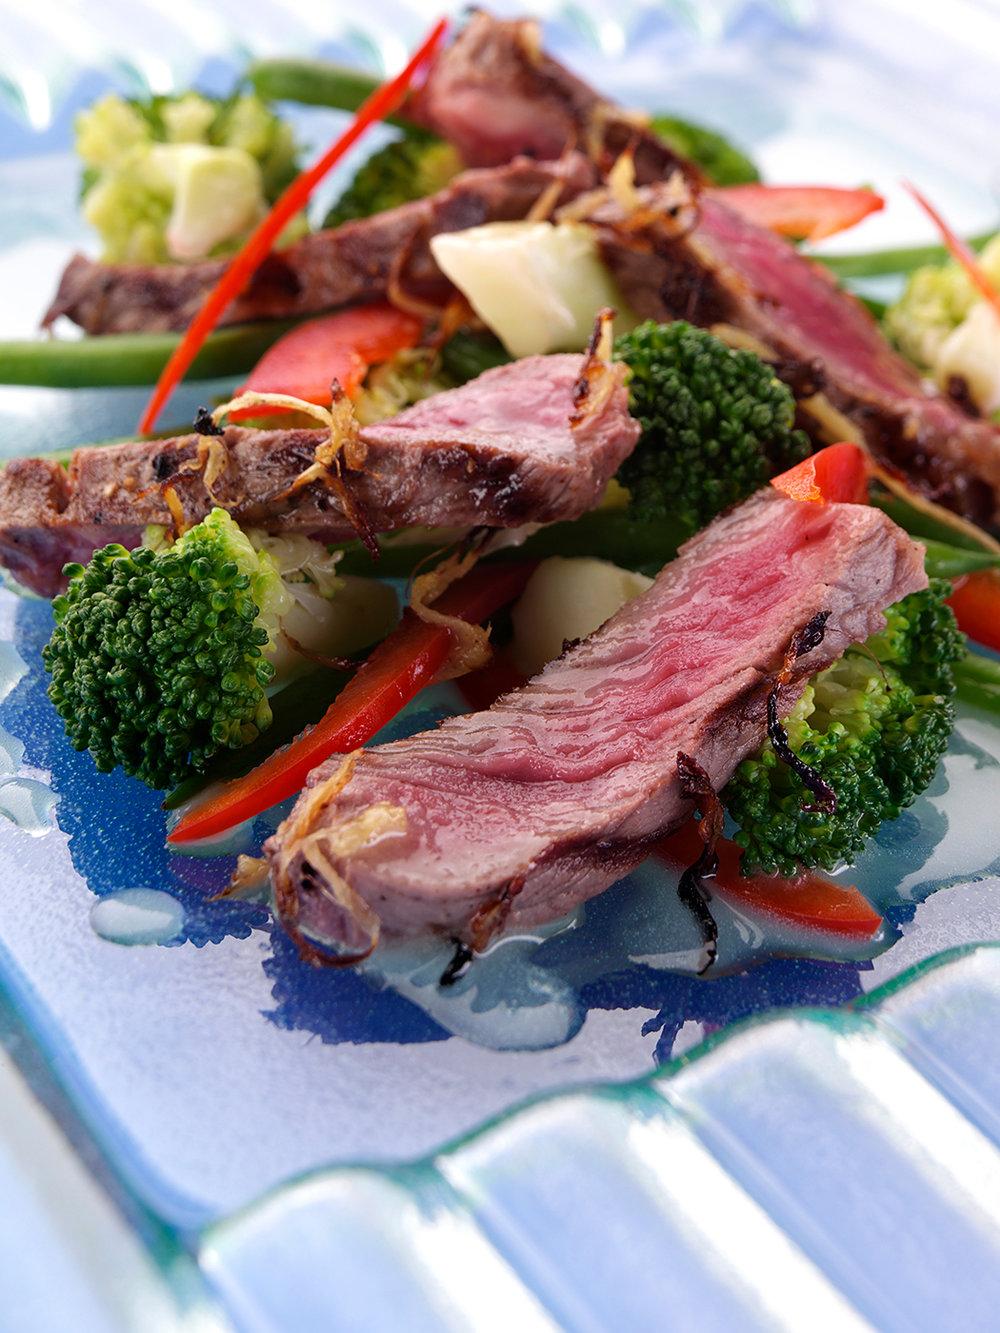 Beef vegetable salad